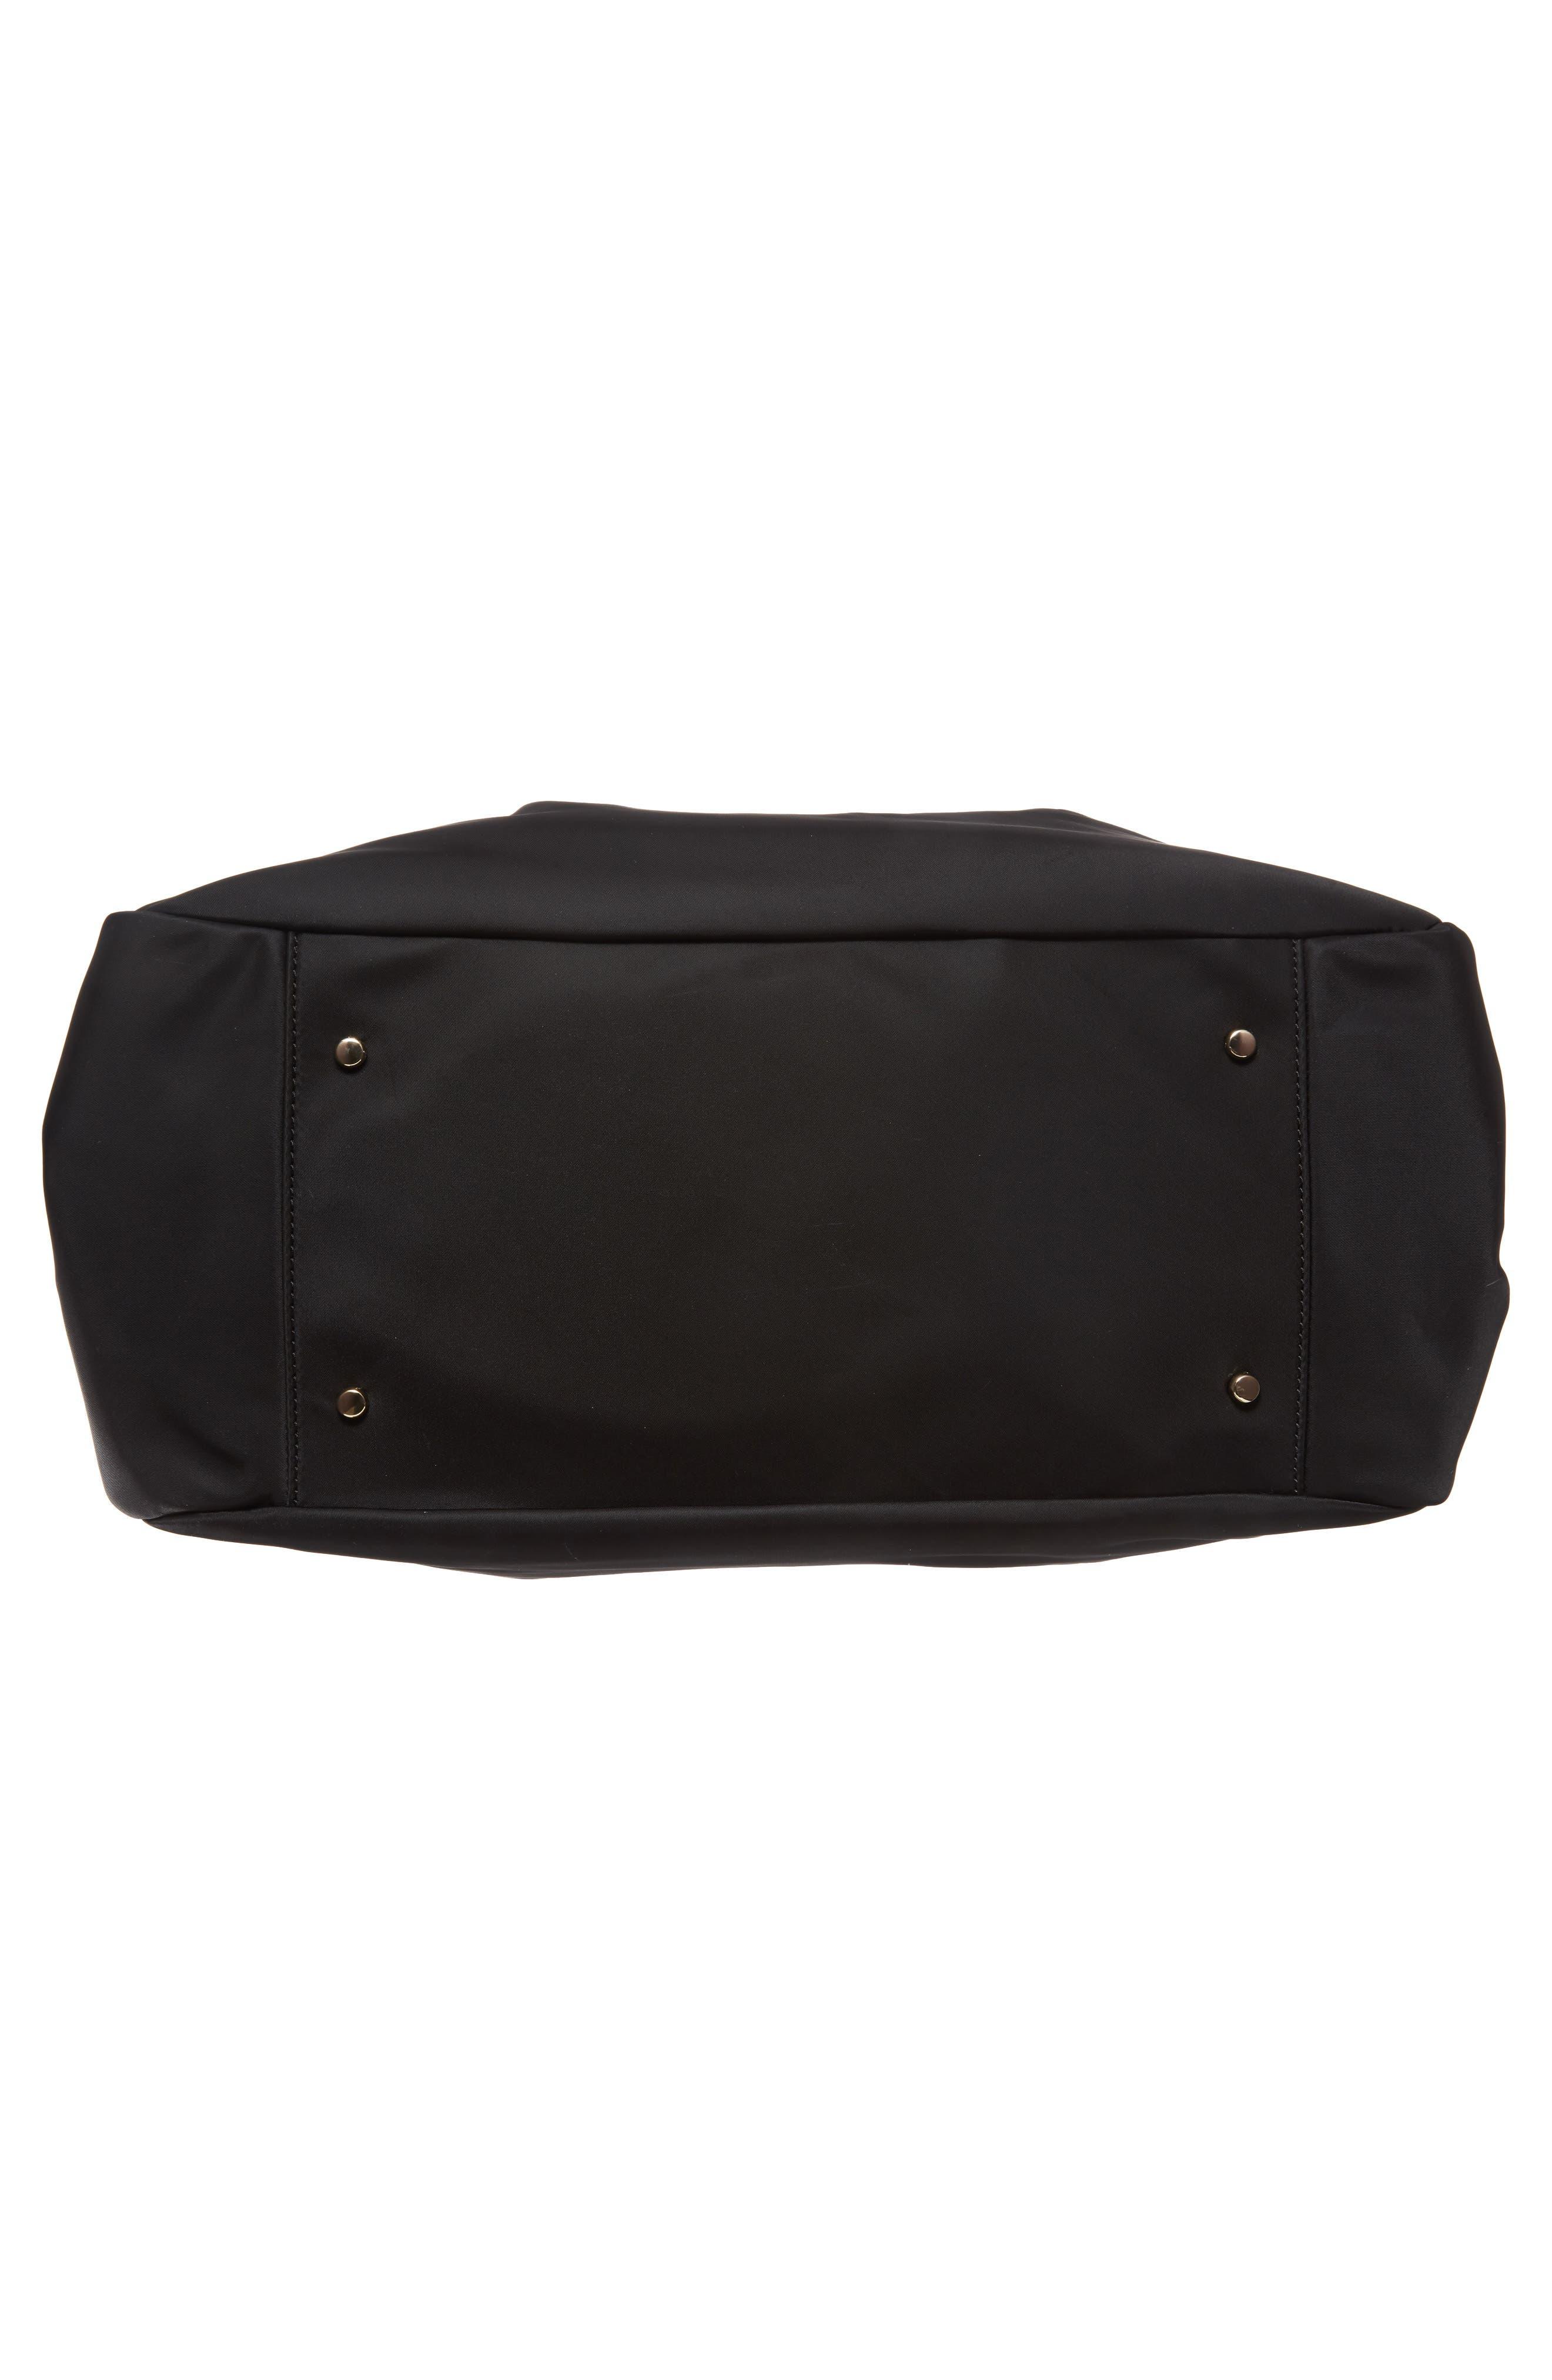 watson lane - stevie diaper bag,                             Alternate thumbnail 6, color,                             BLACK